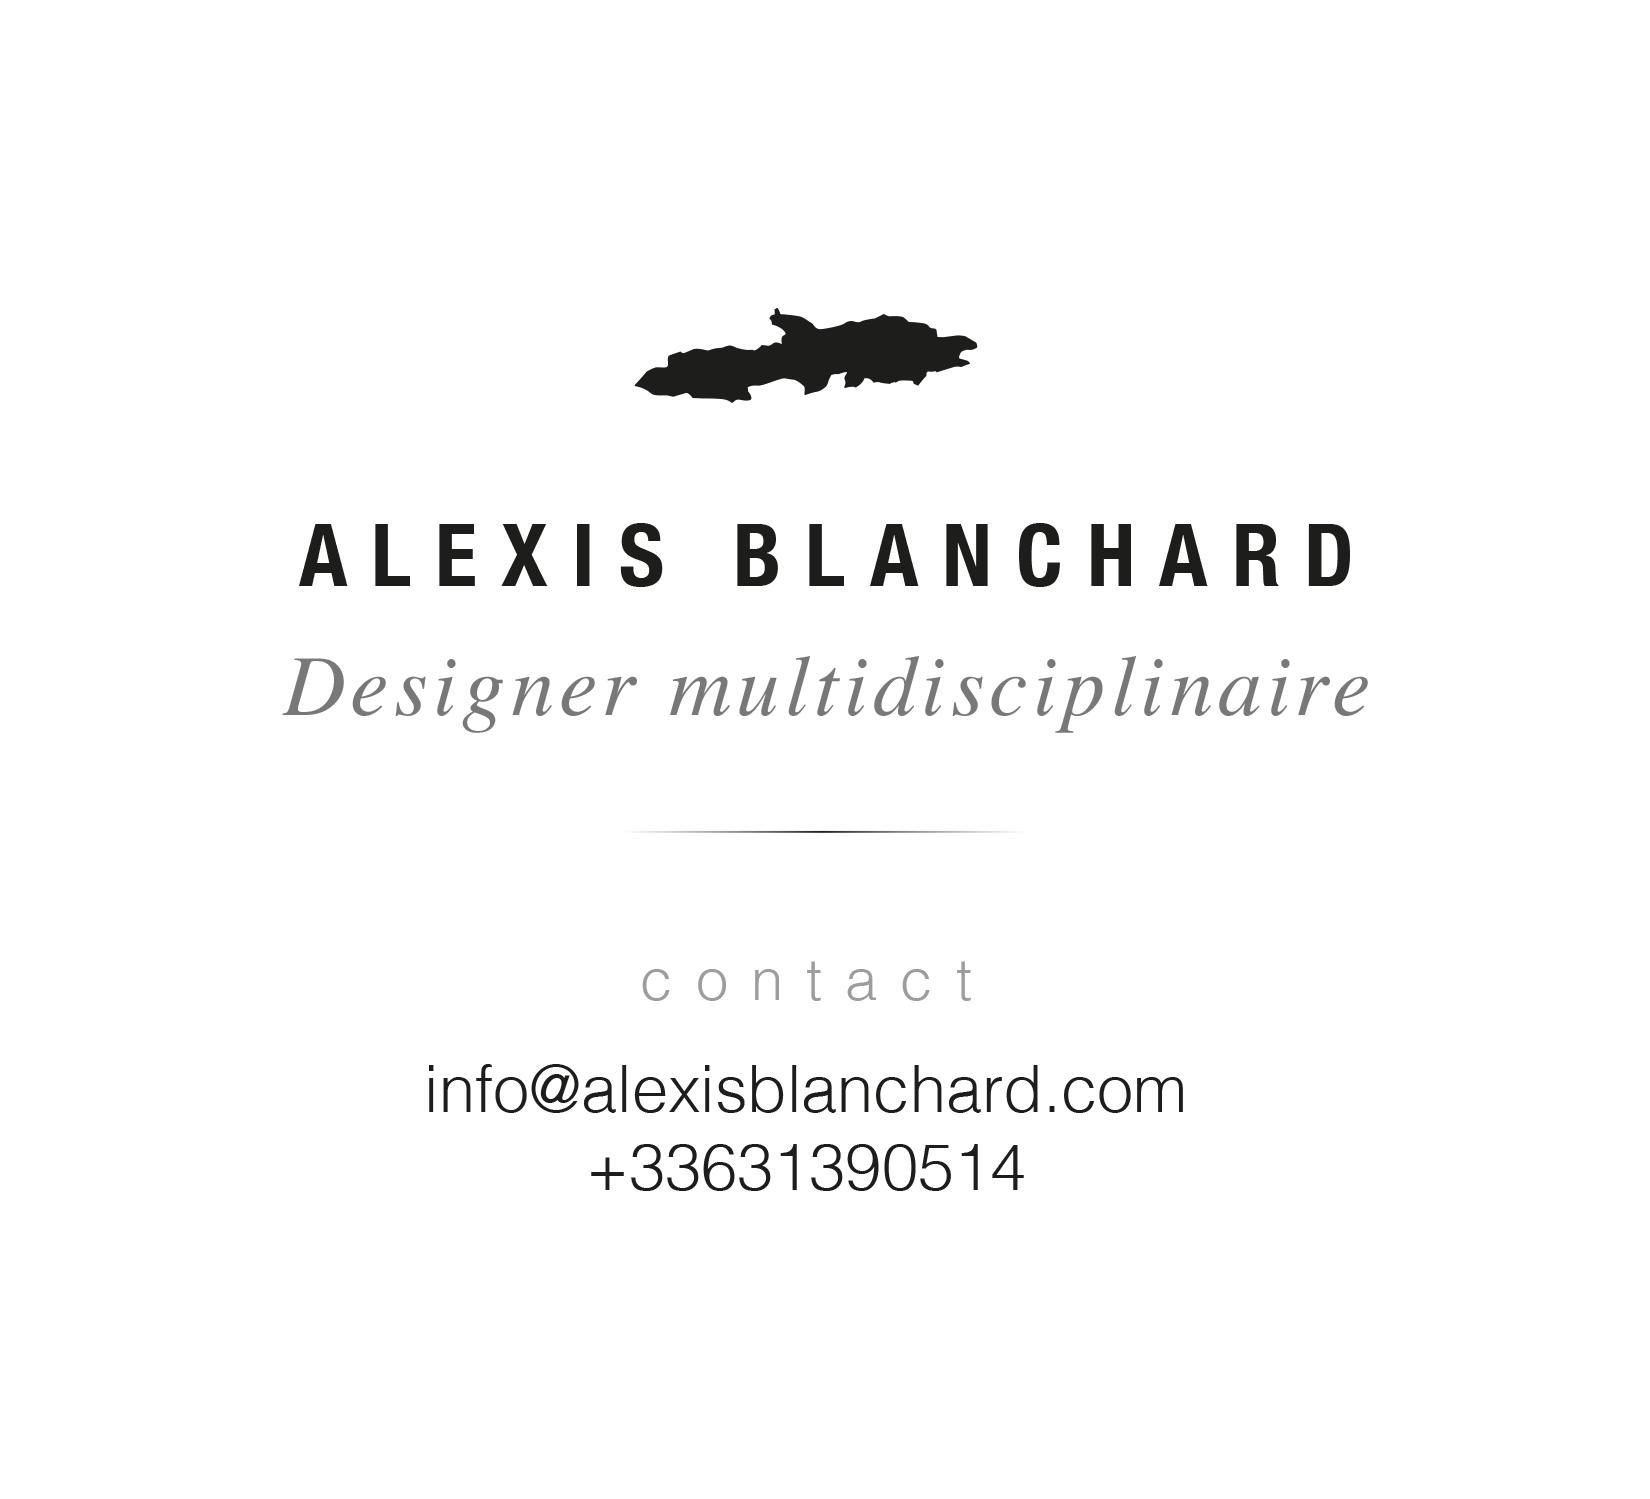 Alexis Blanchard designer